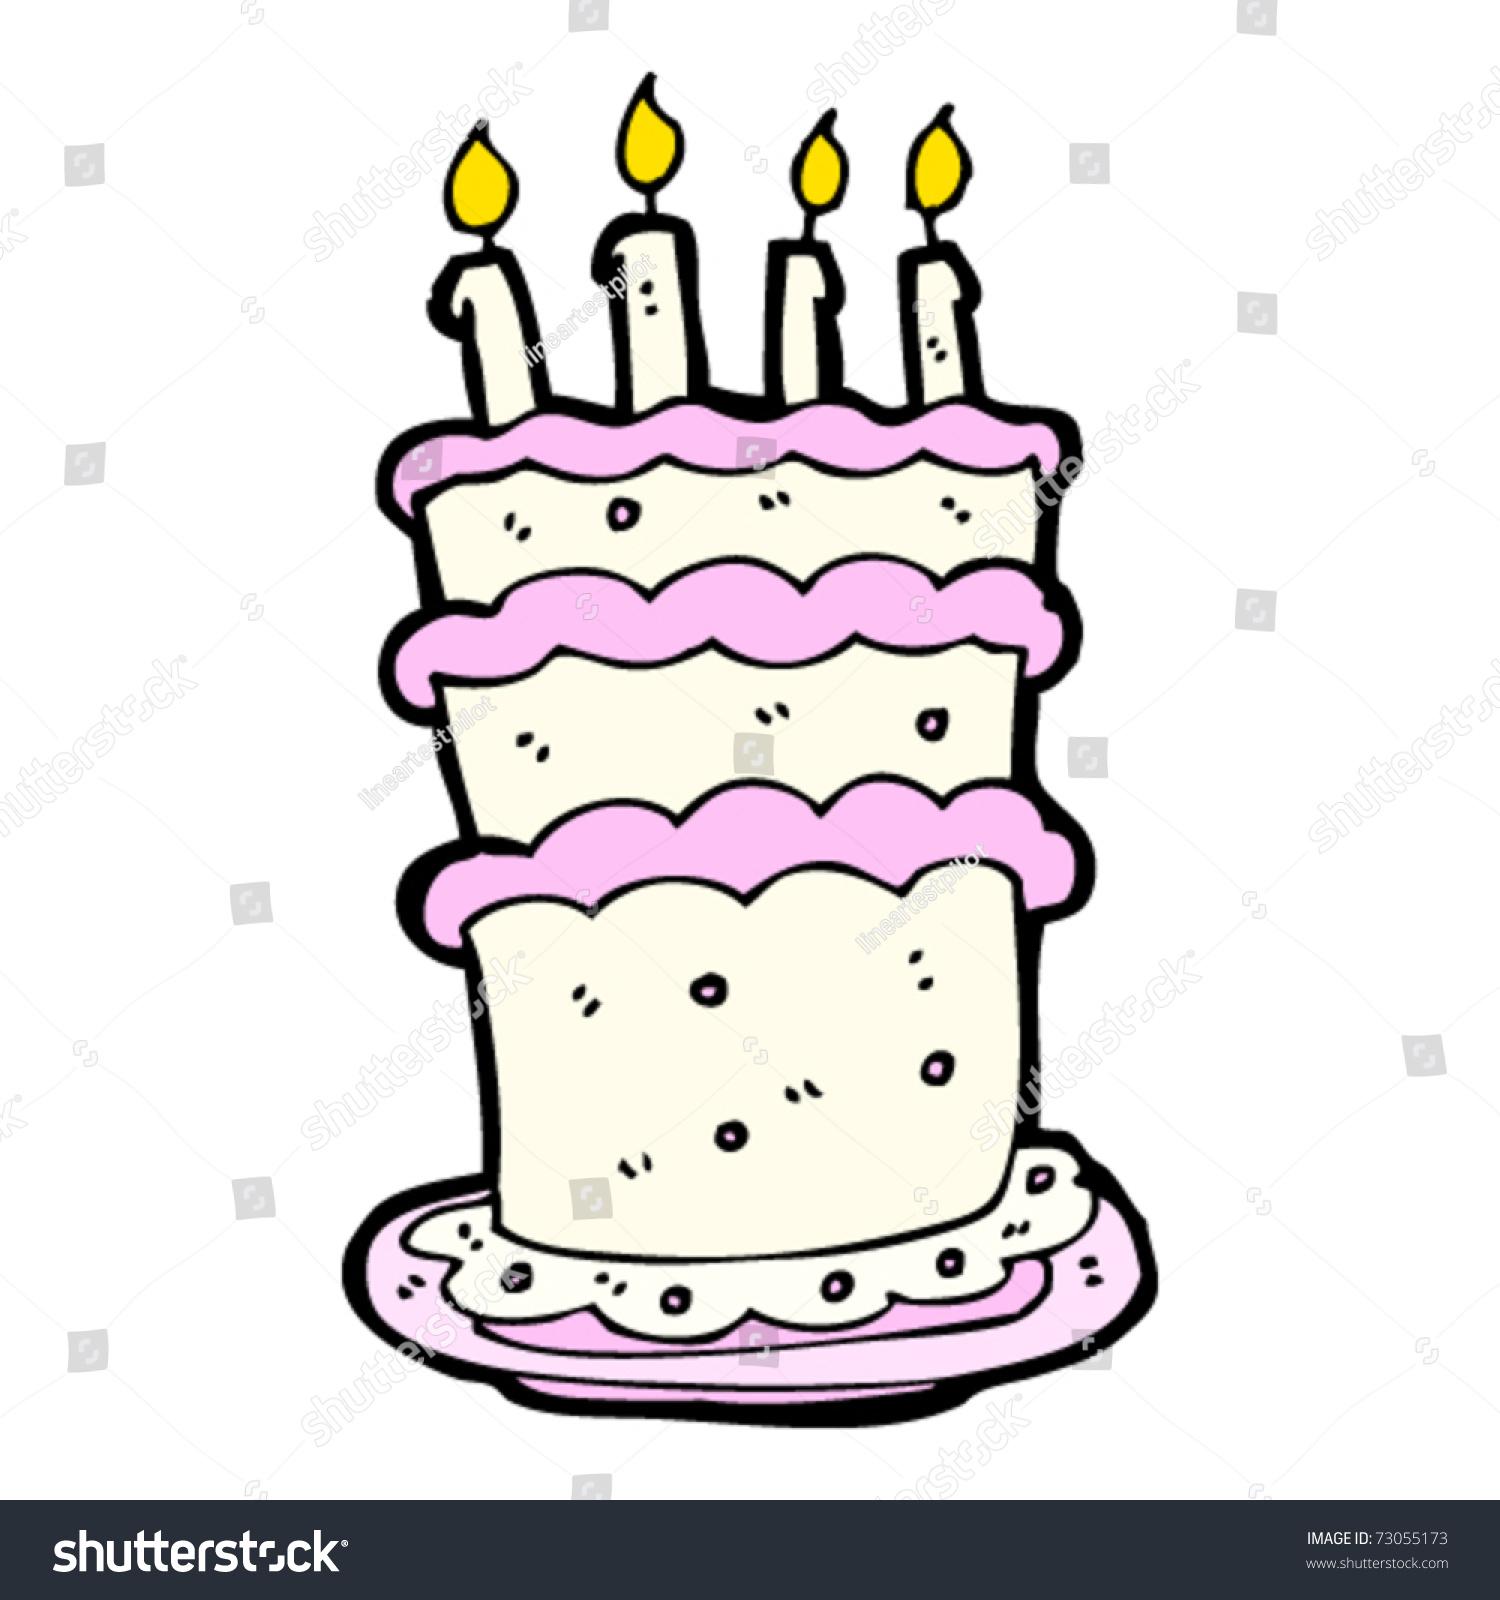 Huge Birthday Cake Cartoon Stock Vector Illustration 73055173 ...